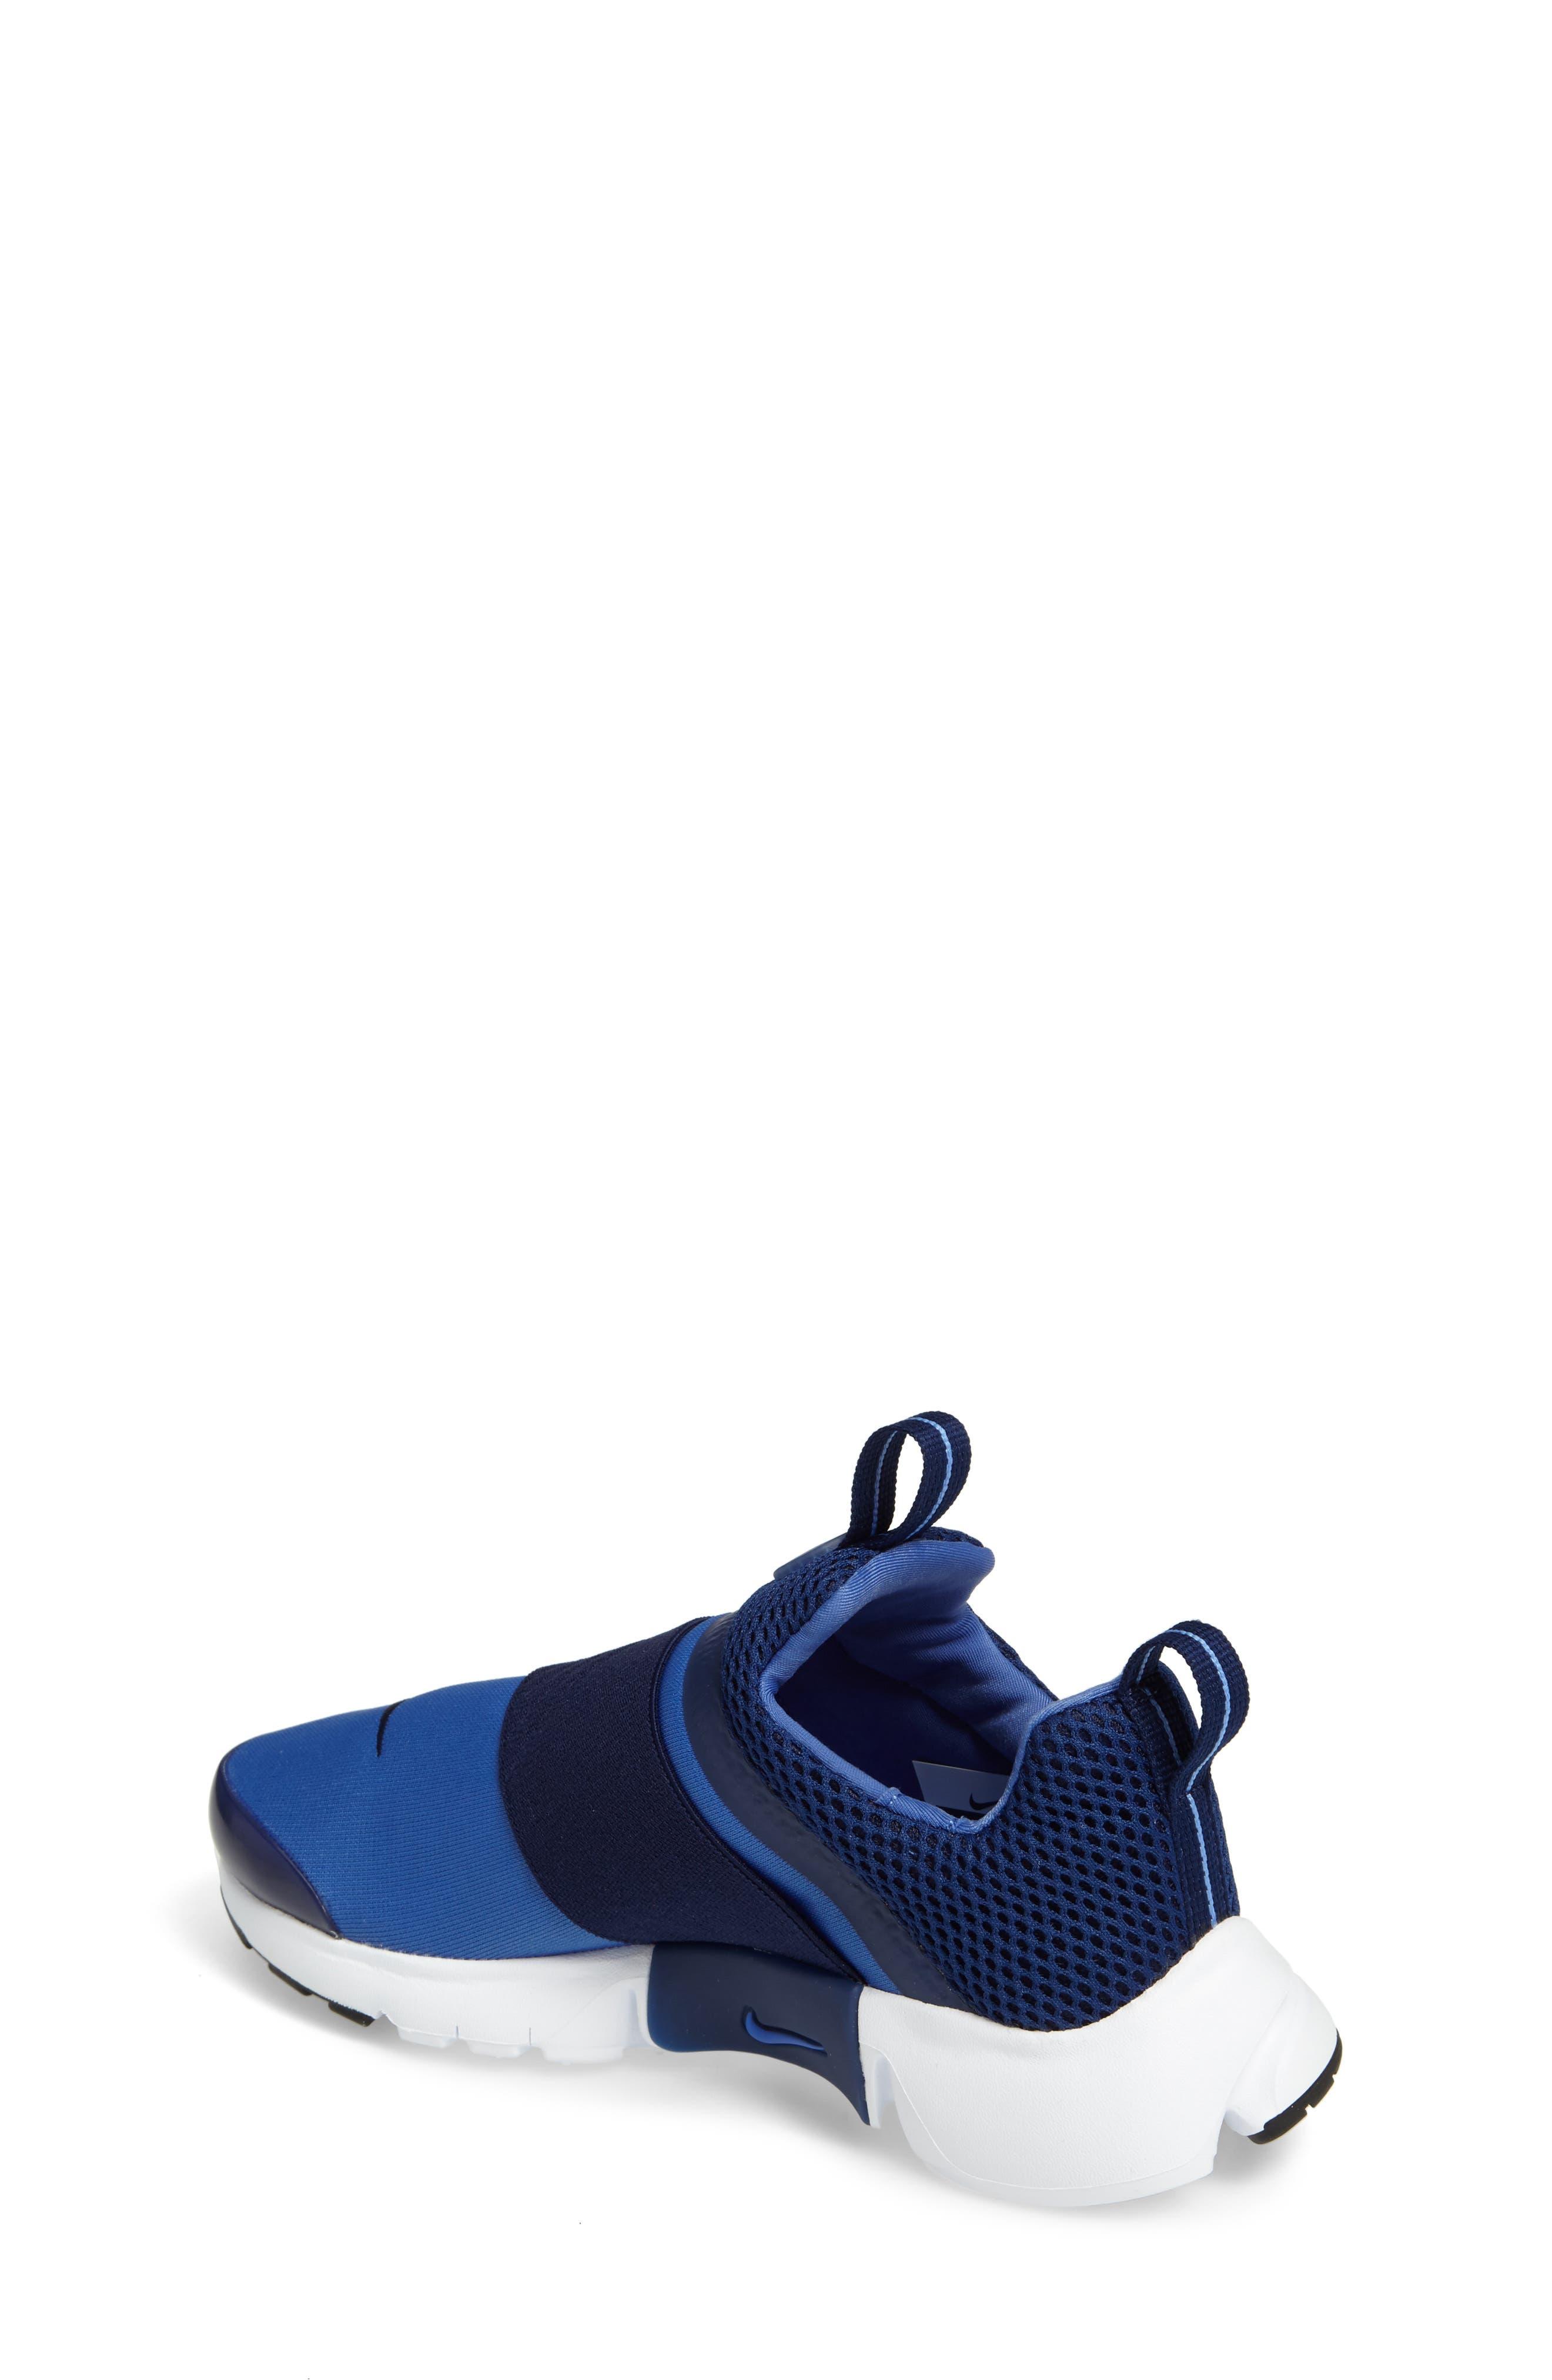 Presto Extreme Sneaker,                             Alternate thumbnail 19, color,